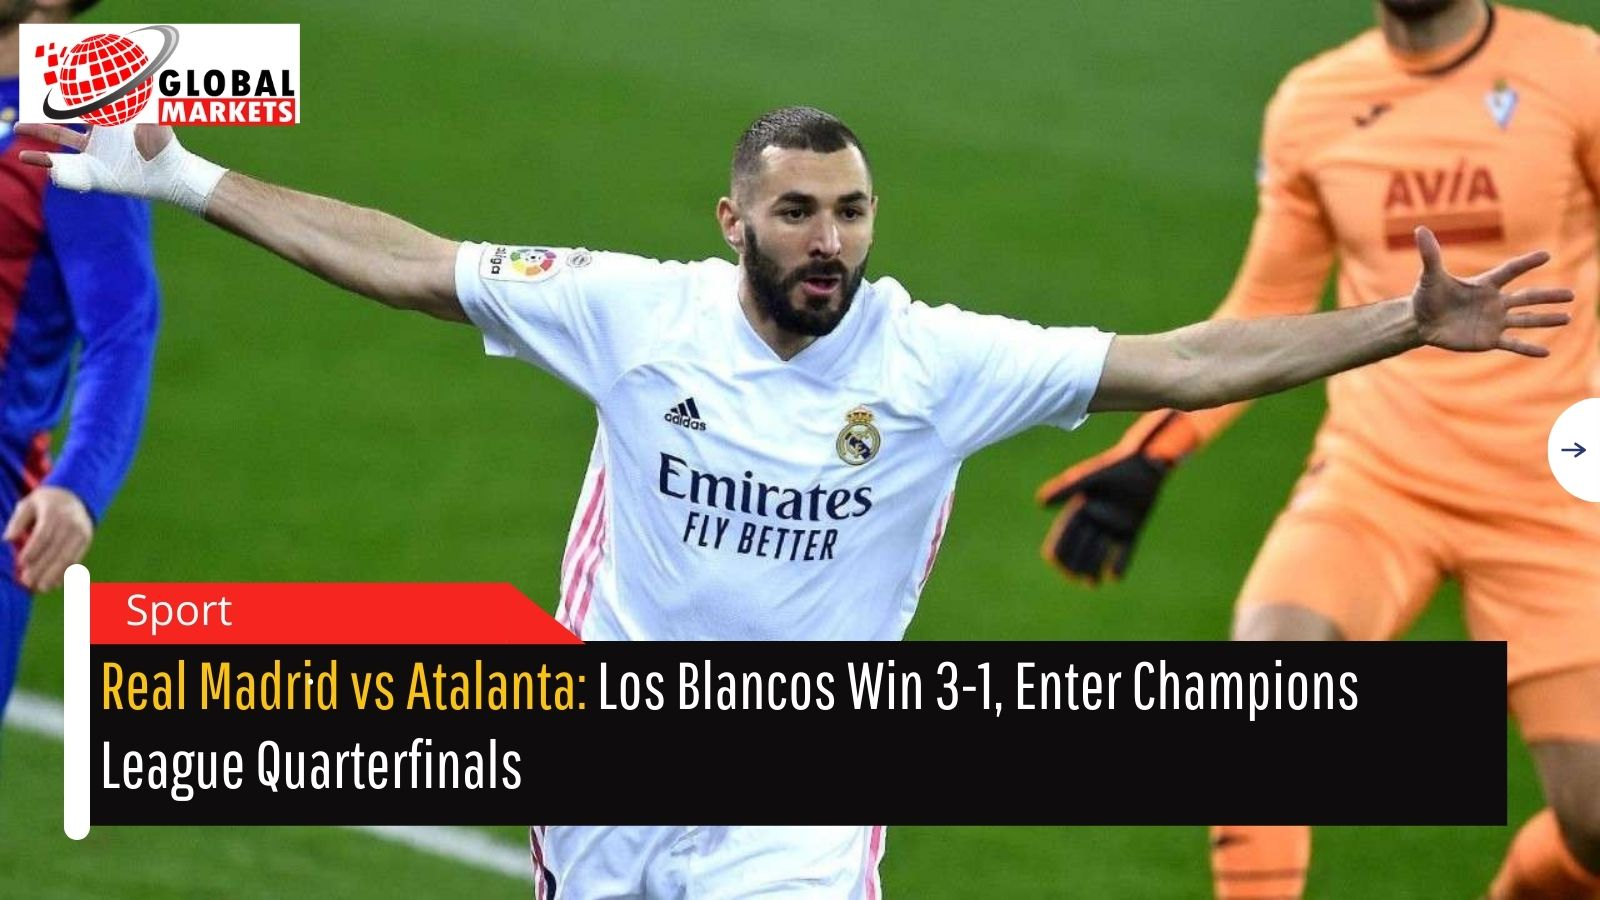 Real Madrid vs Atalanta: Los Blancos Win 3-1, Enter Champions League Quarterfinals